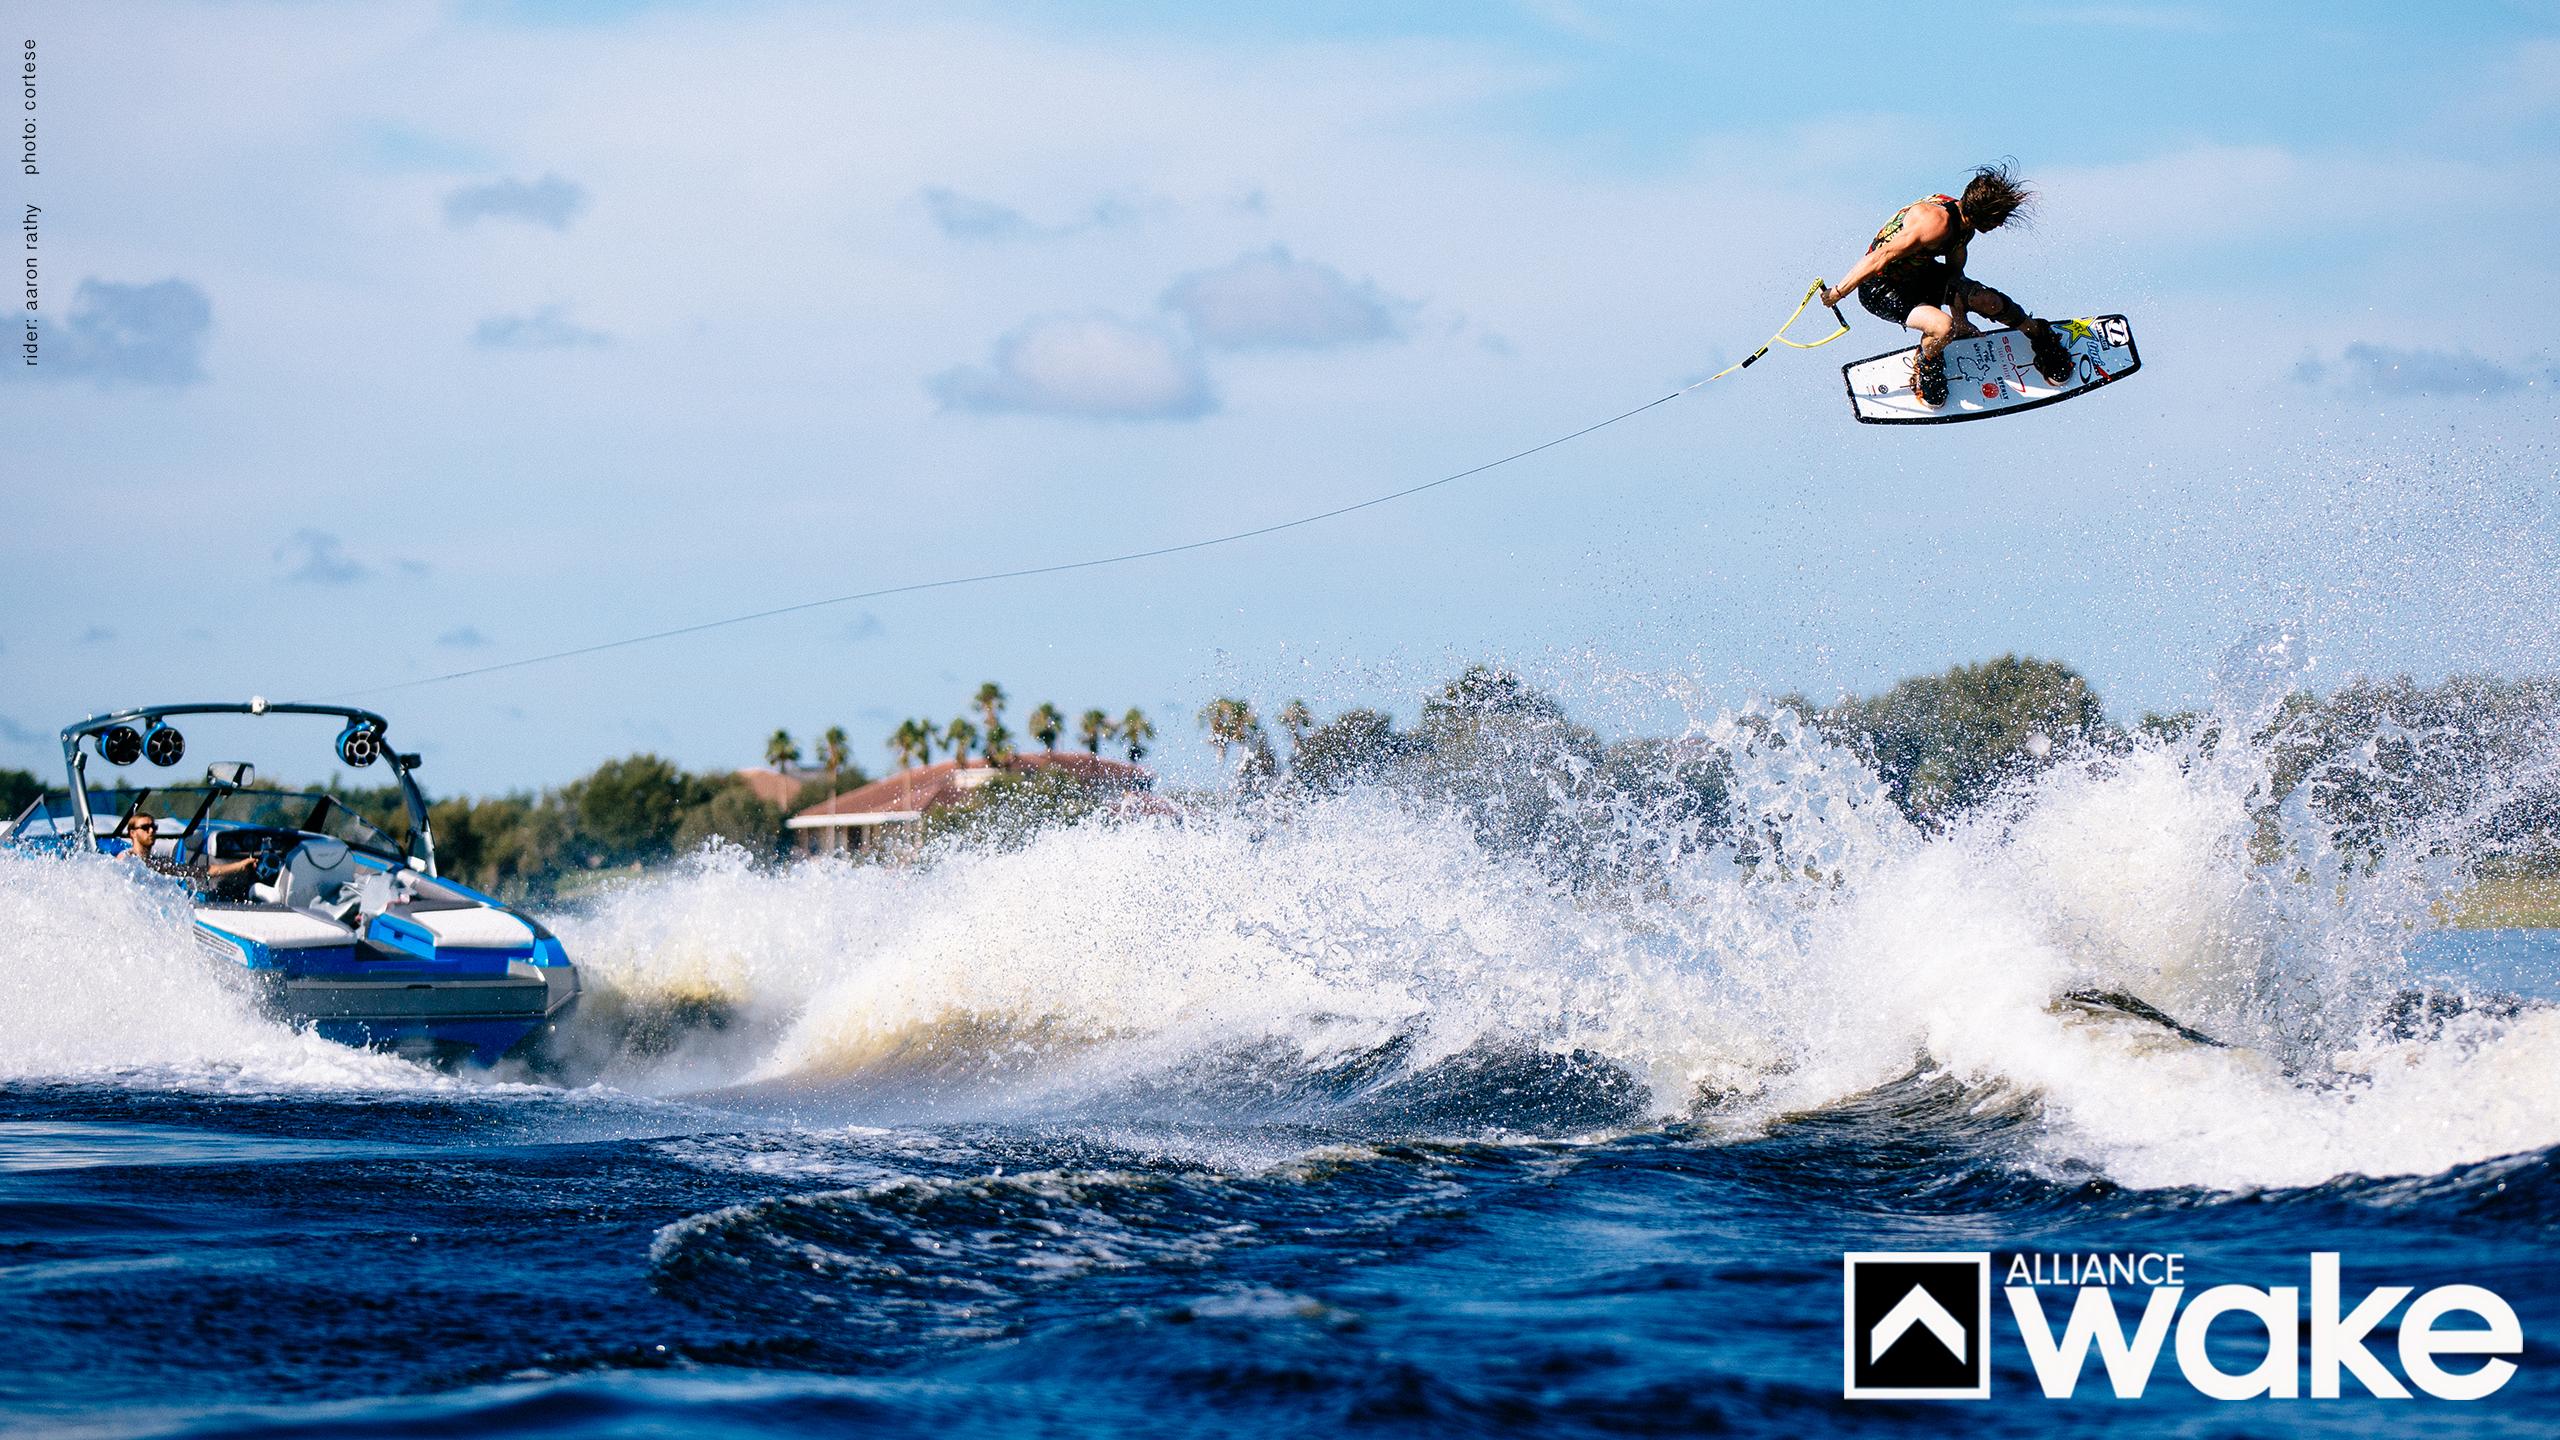 Wakeboarding Boat Wallpaper Wallpapers: Dou...